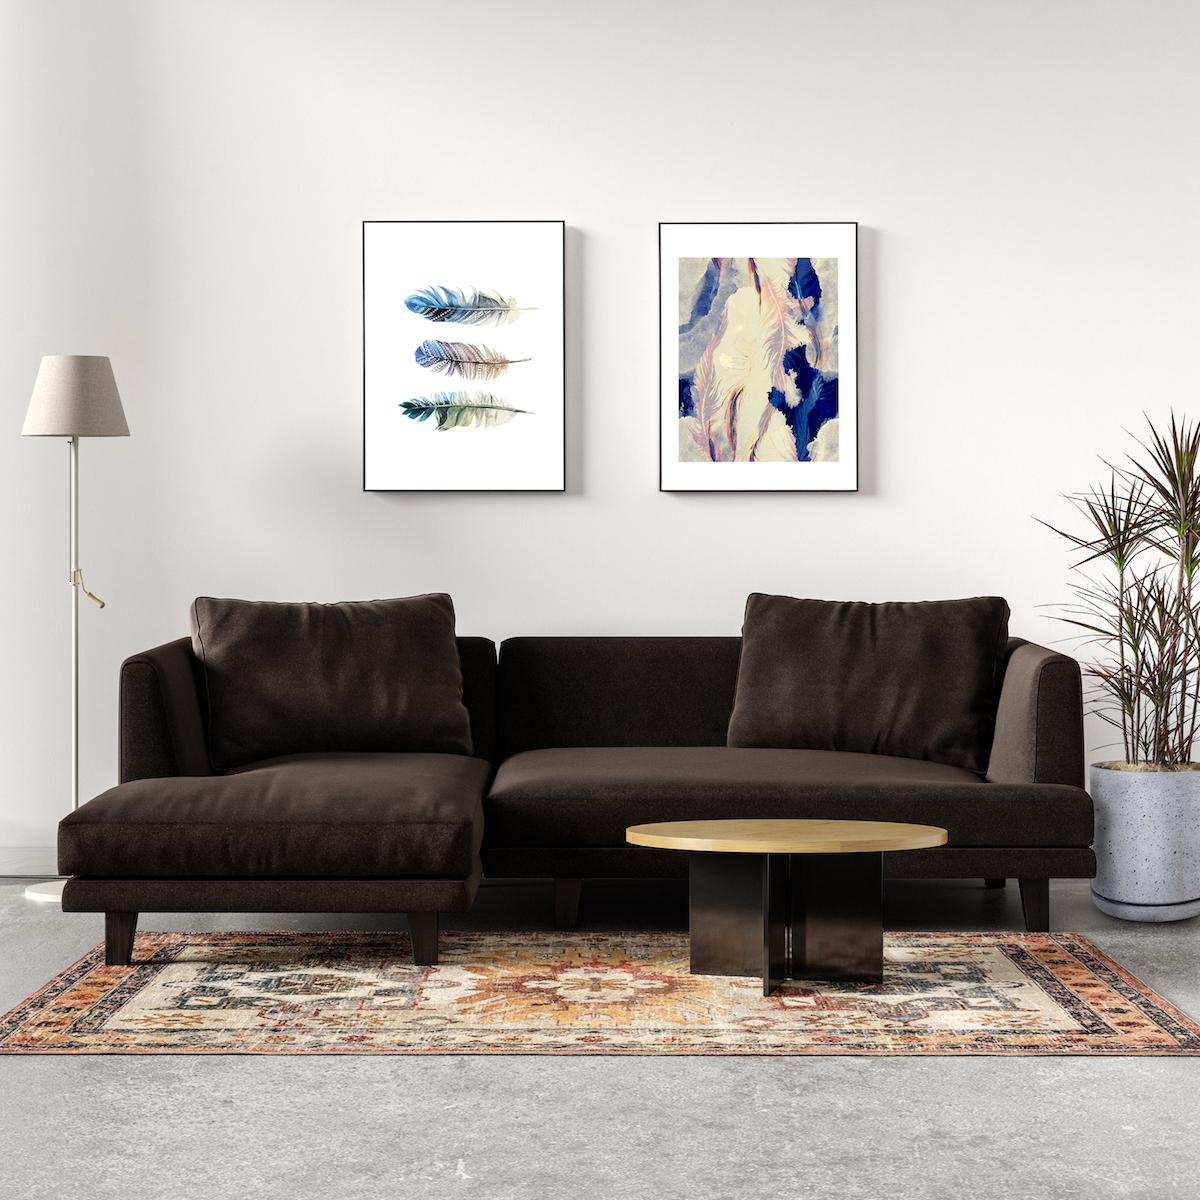 Project 05 - Living Room - Set 02.1.jpg